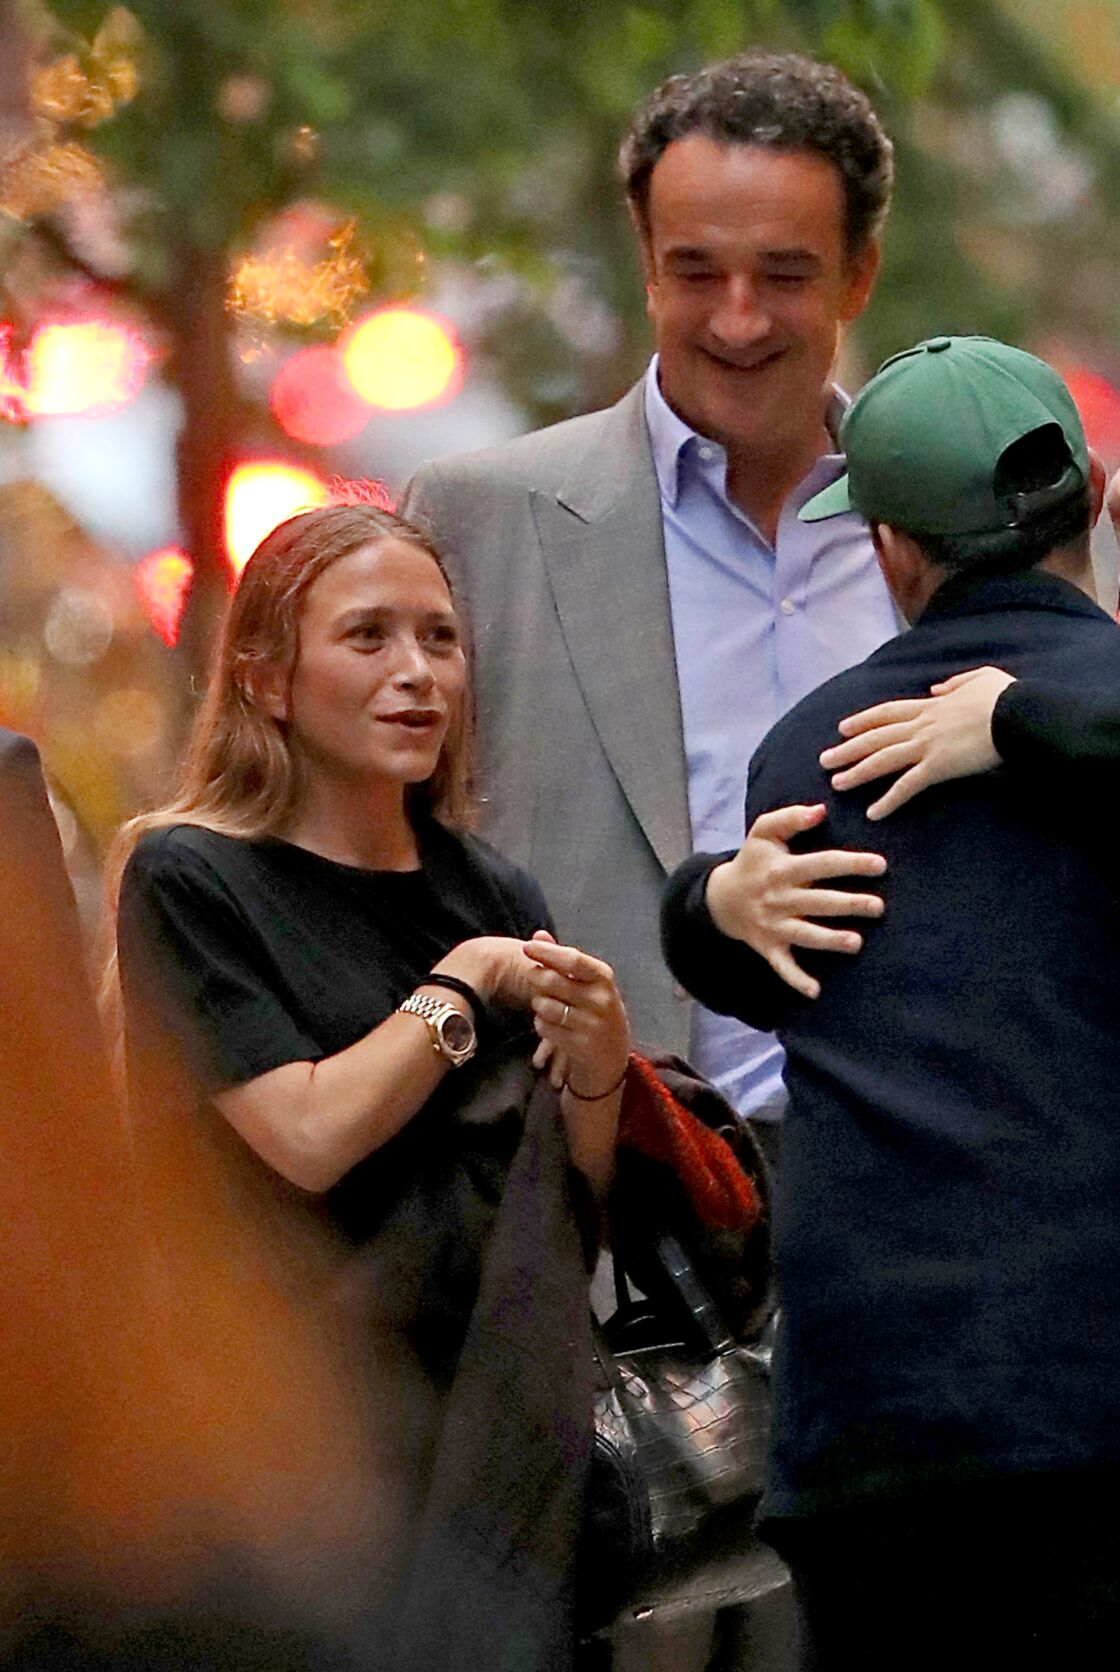 Mary-Kate Olsen et Olivier Sarkozy, le 13 juin 2019